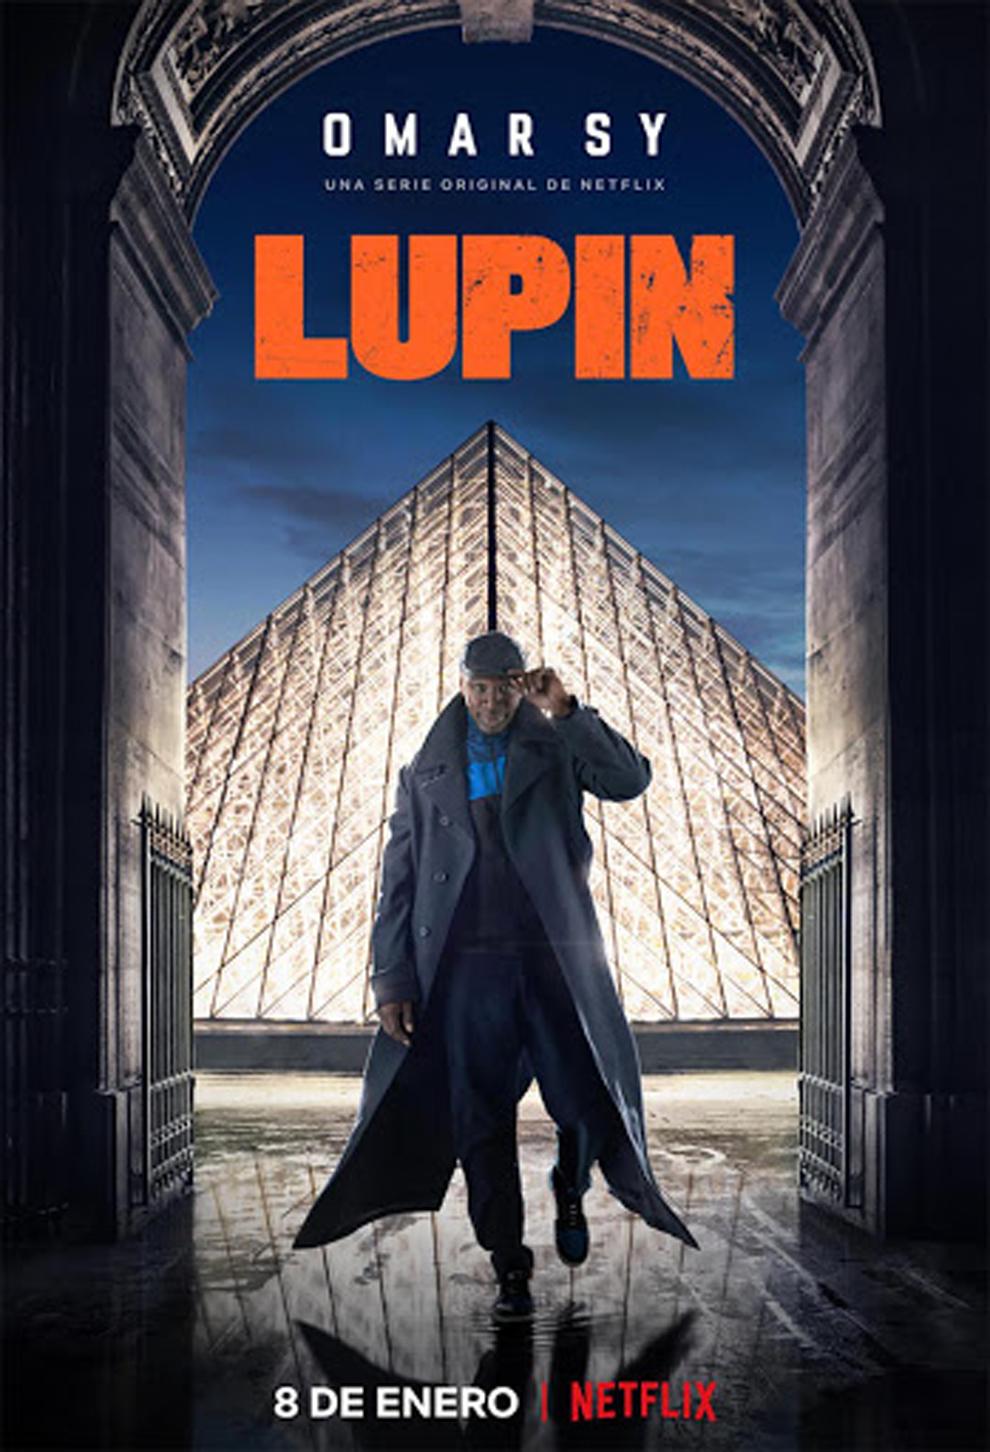 Series Netflix: 'Lupin', un ladrón de guante blanco llega a Netflix   Marca